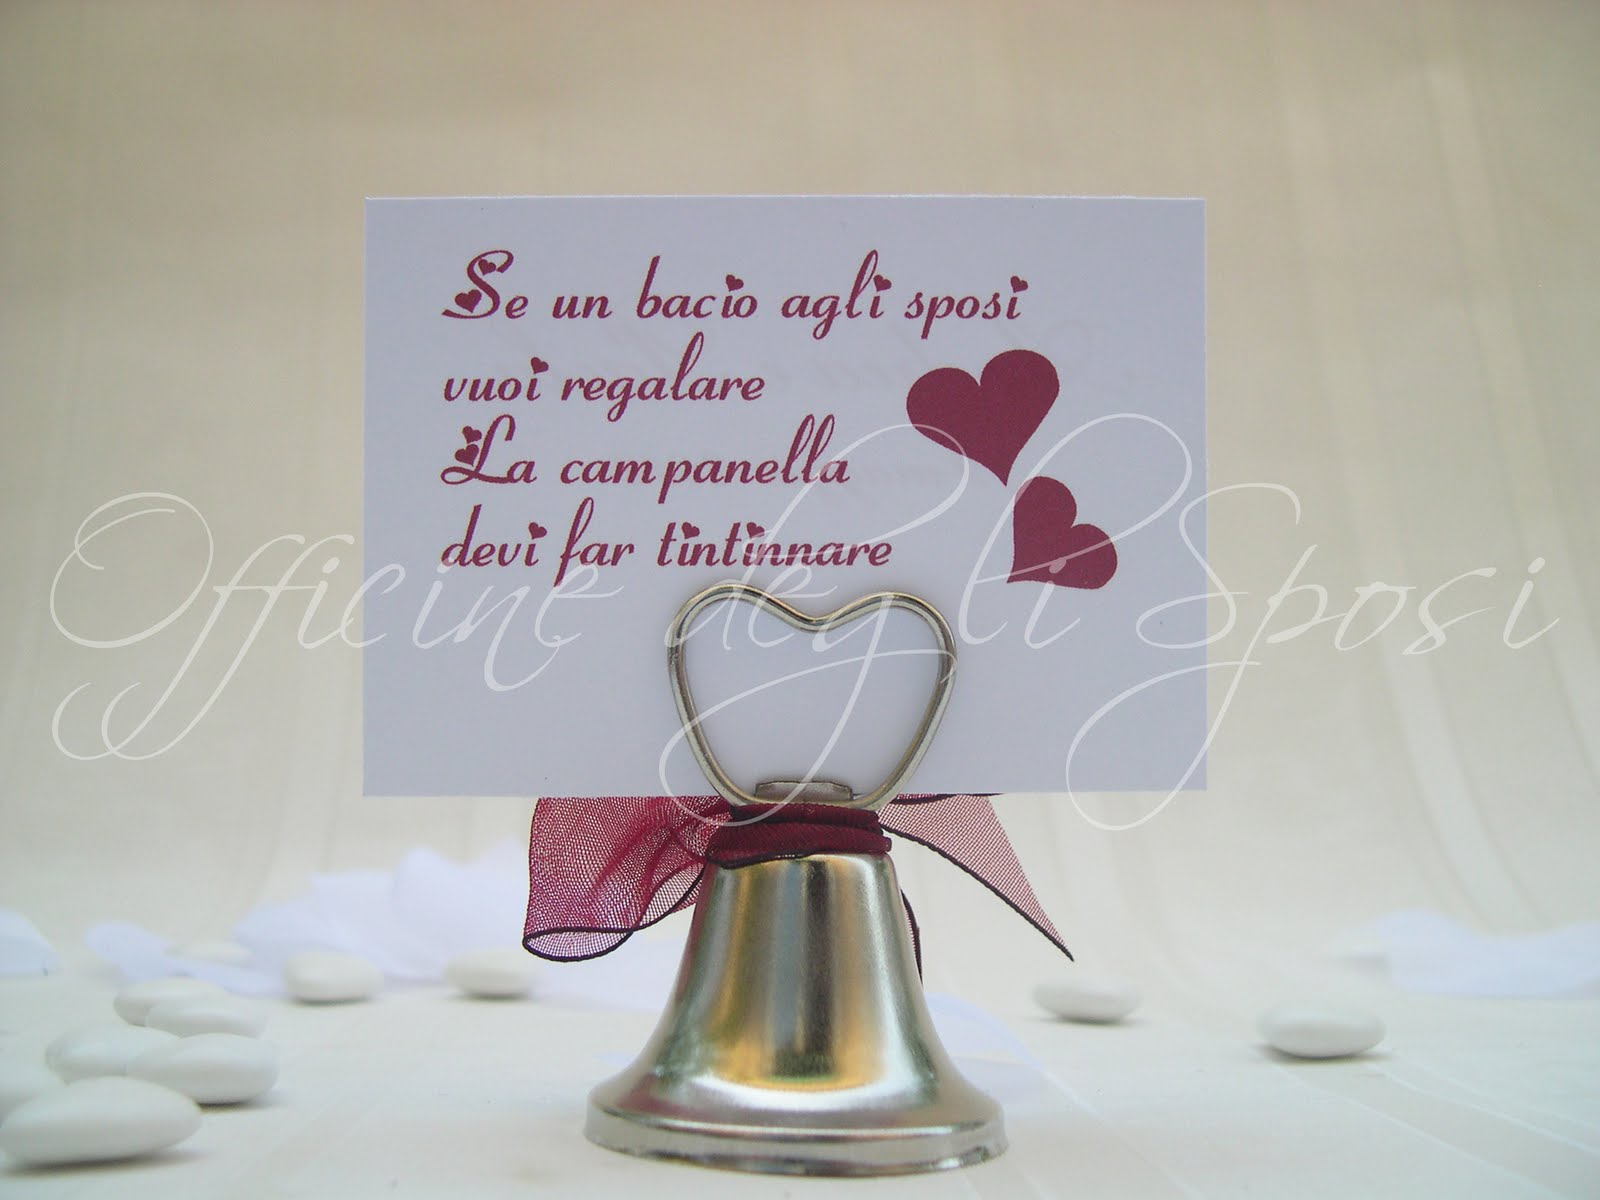 Frasi Auguri Matrimonio Originali : Frasi ringraziamento matrimonio segnaposto